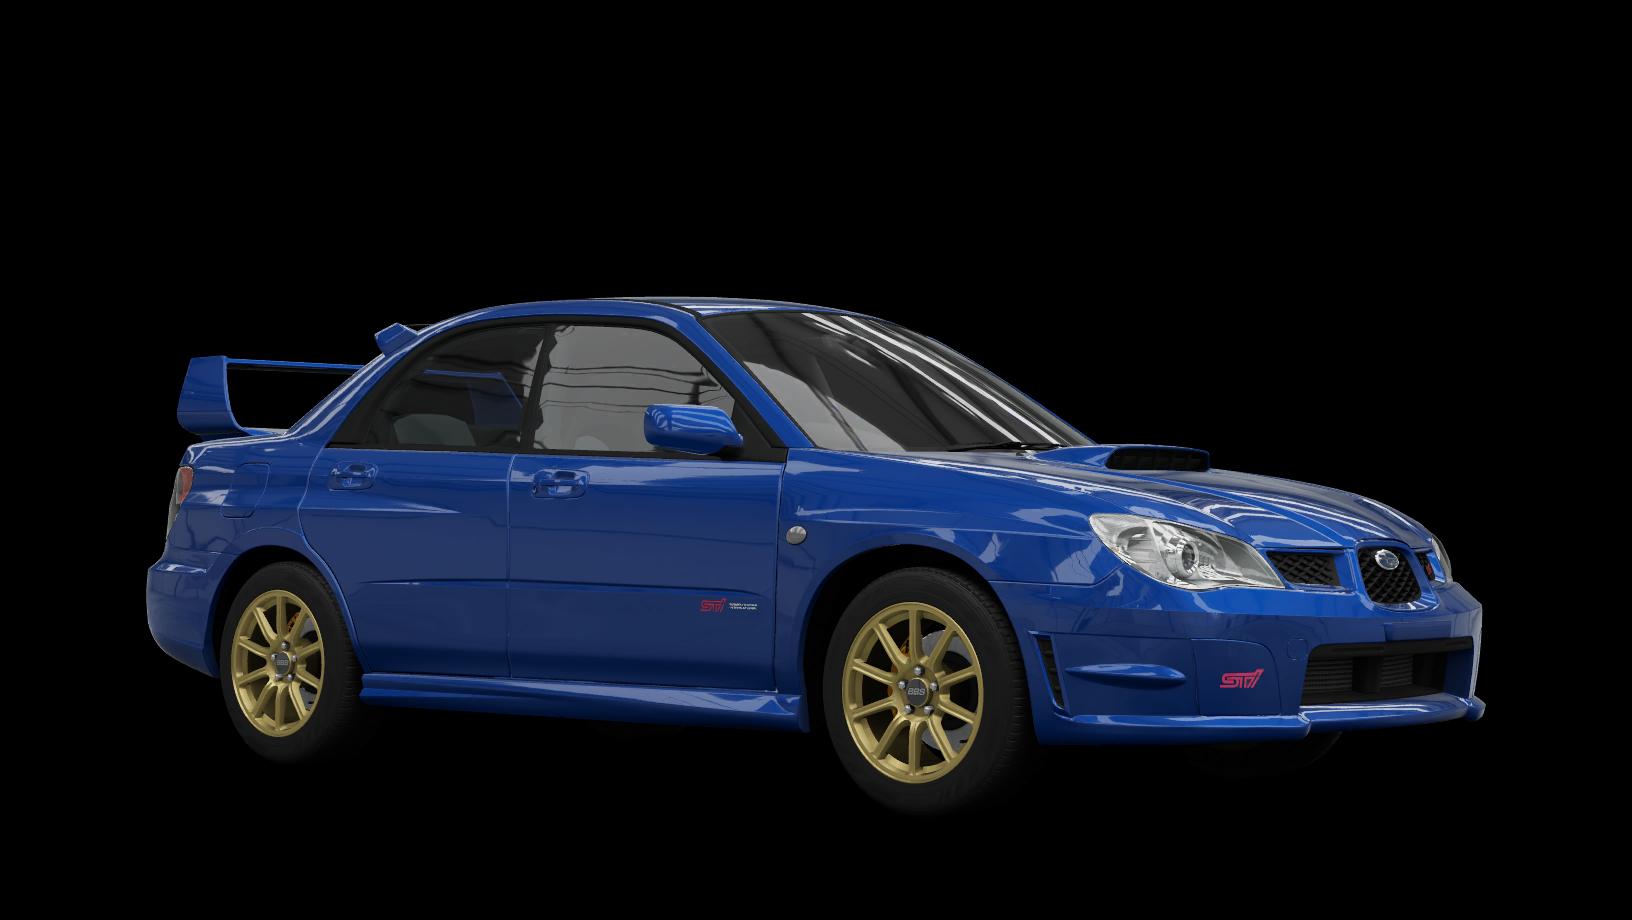 Subaru Impreza WRX STi (2005)